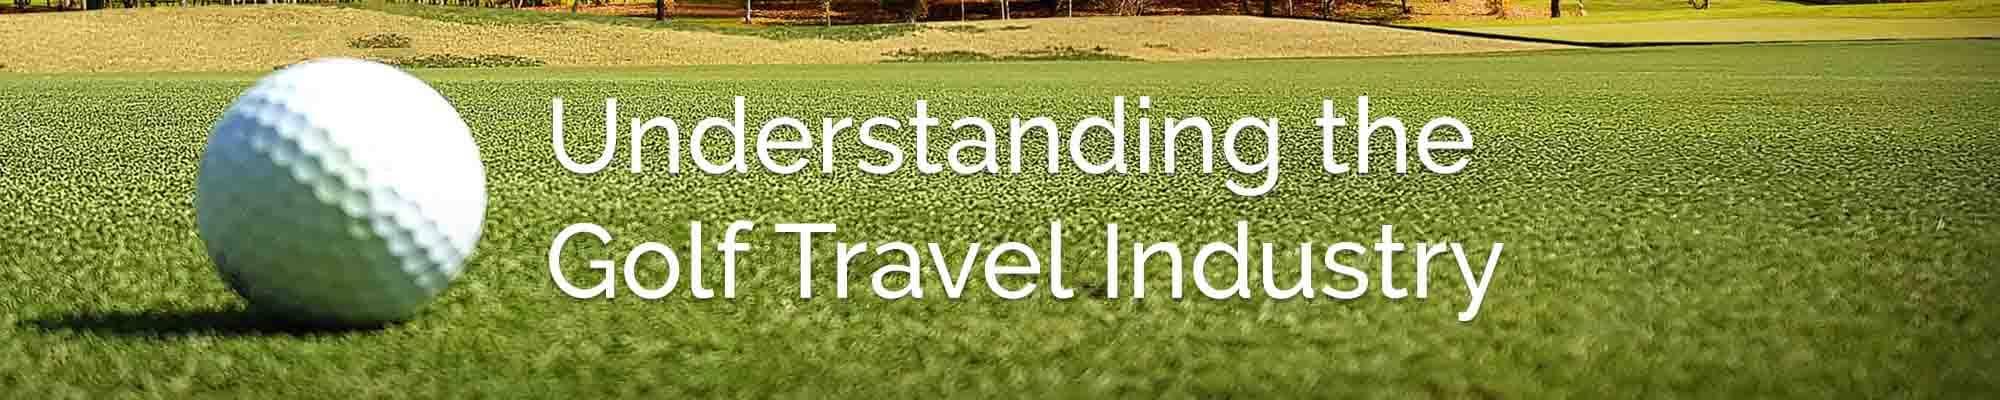 Golf tour operator